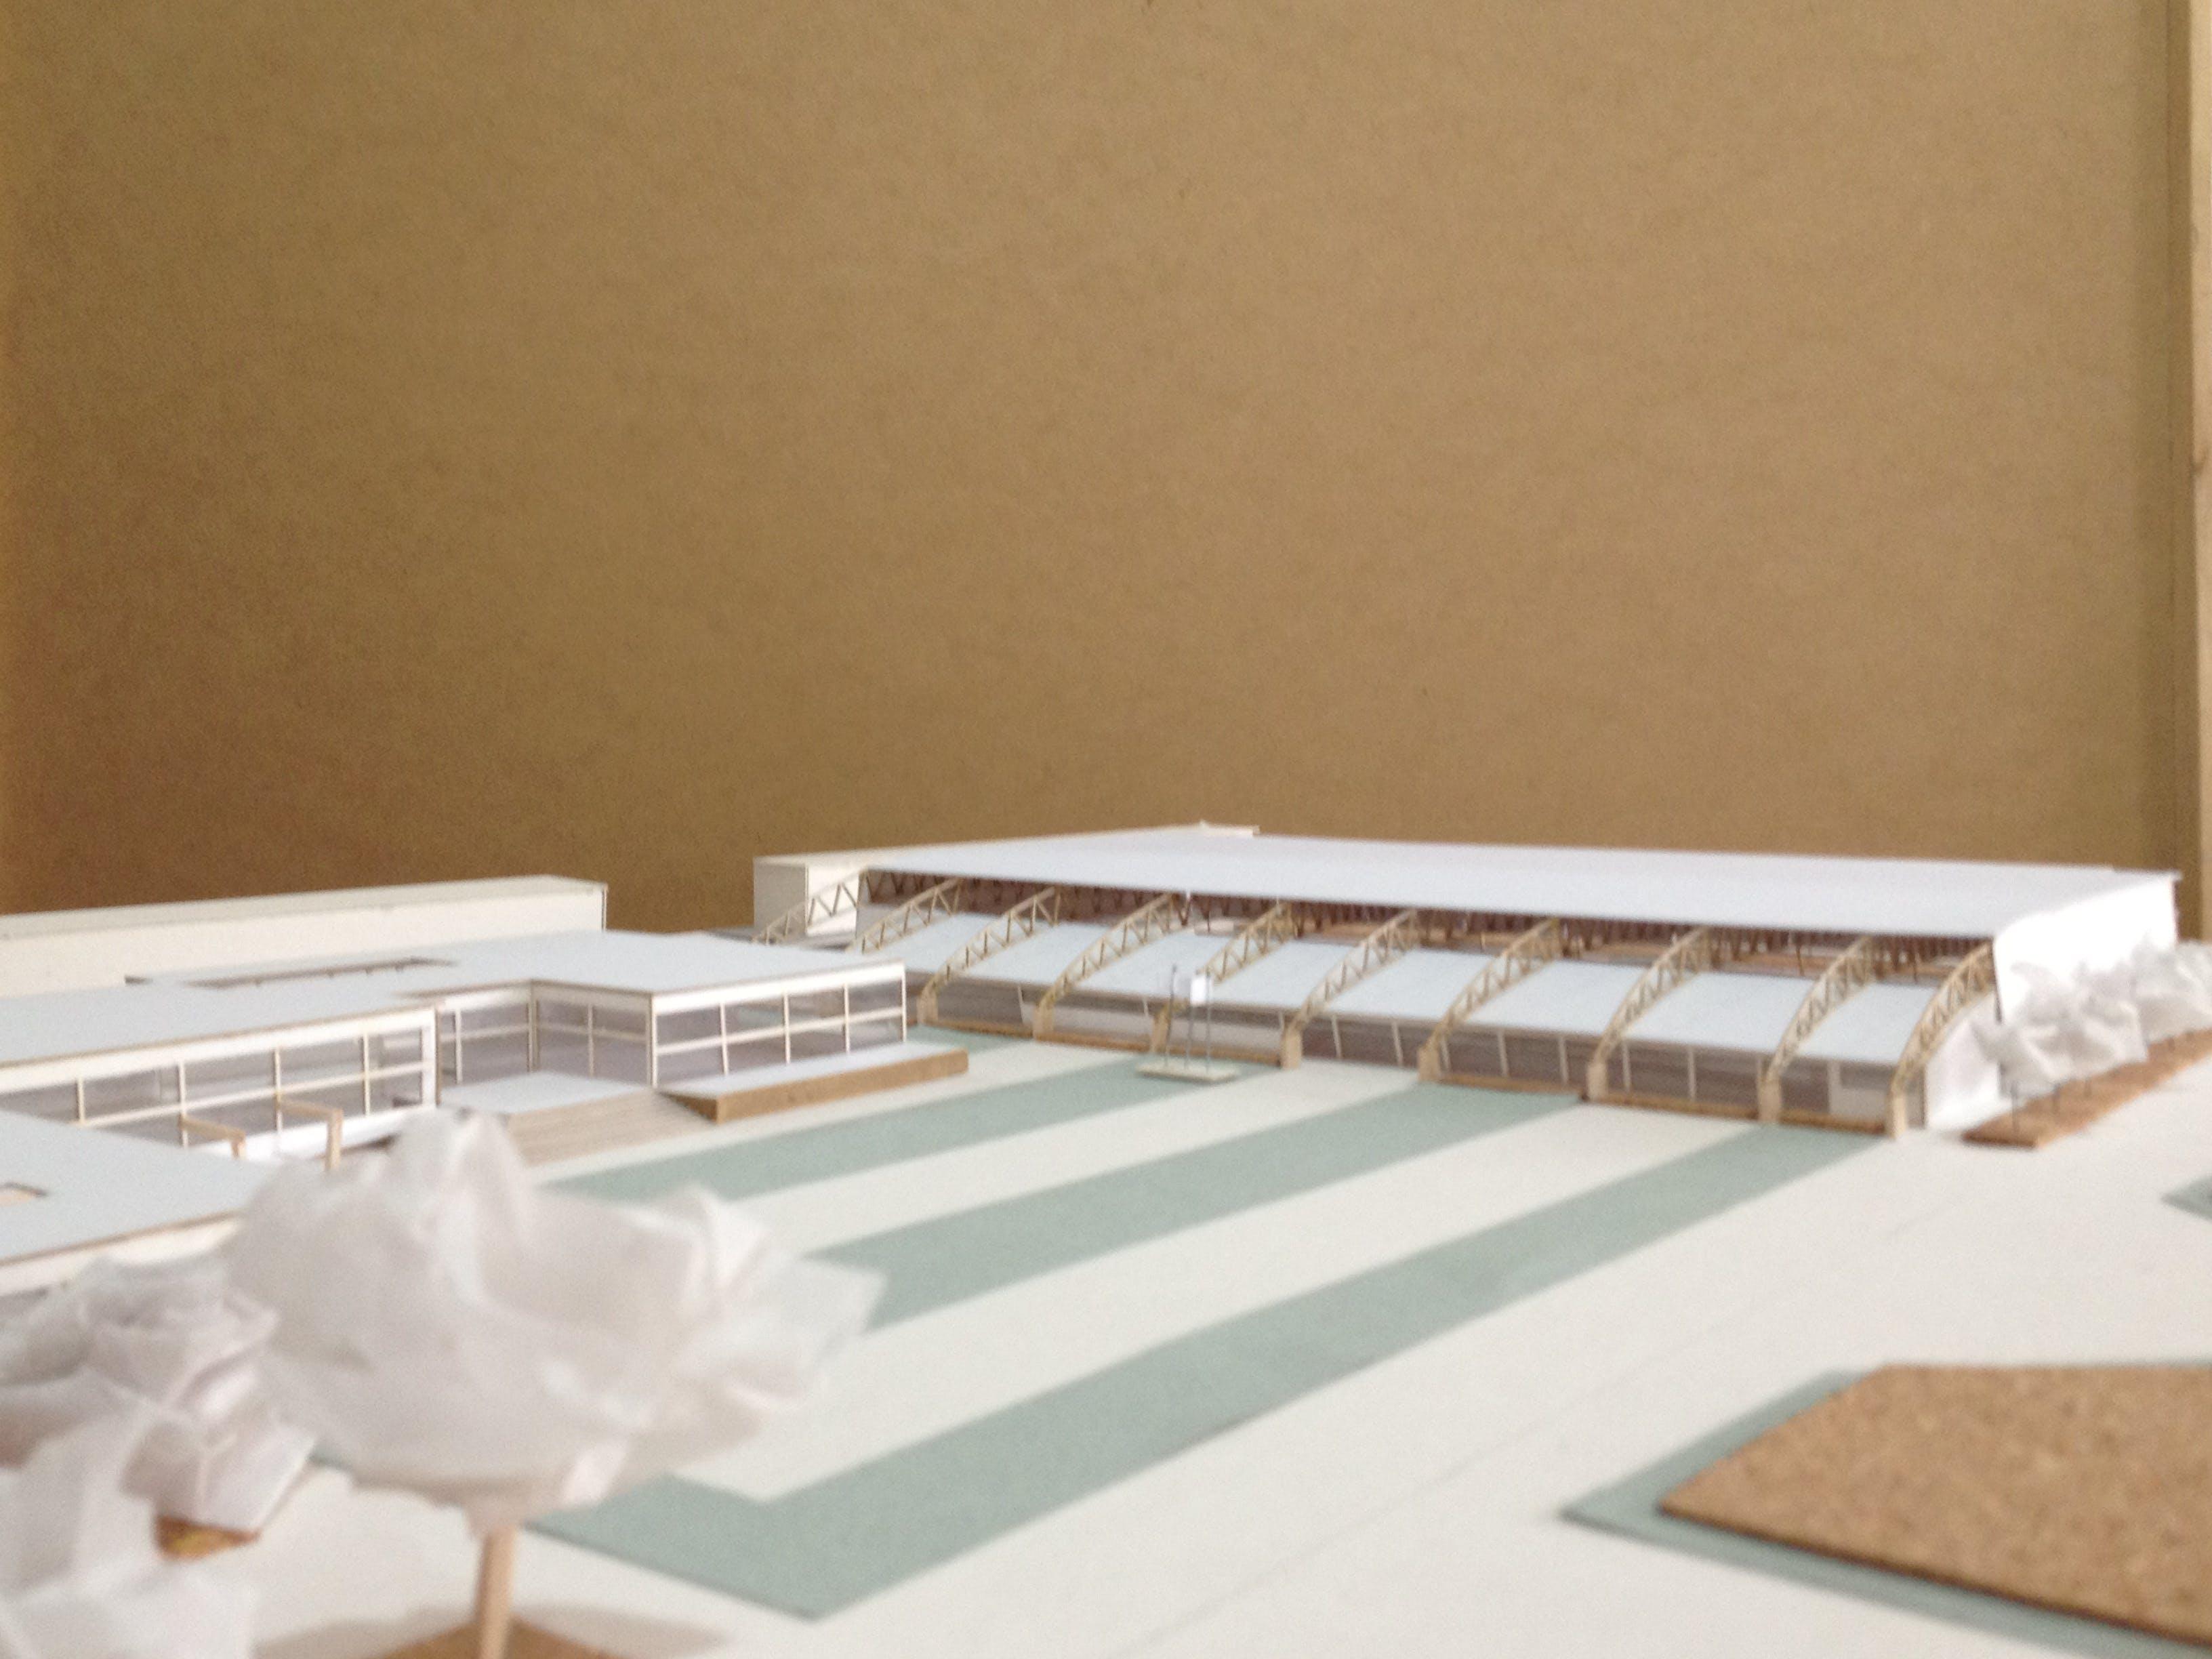 Sport Center Daniel Arias Archinect